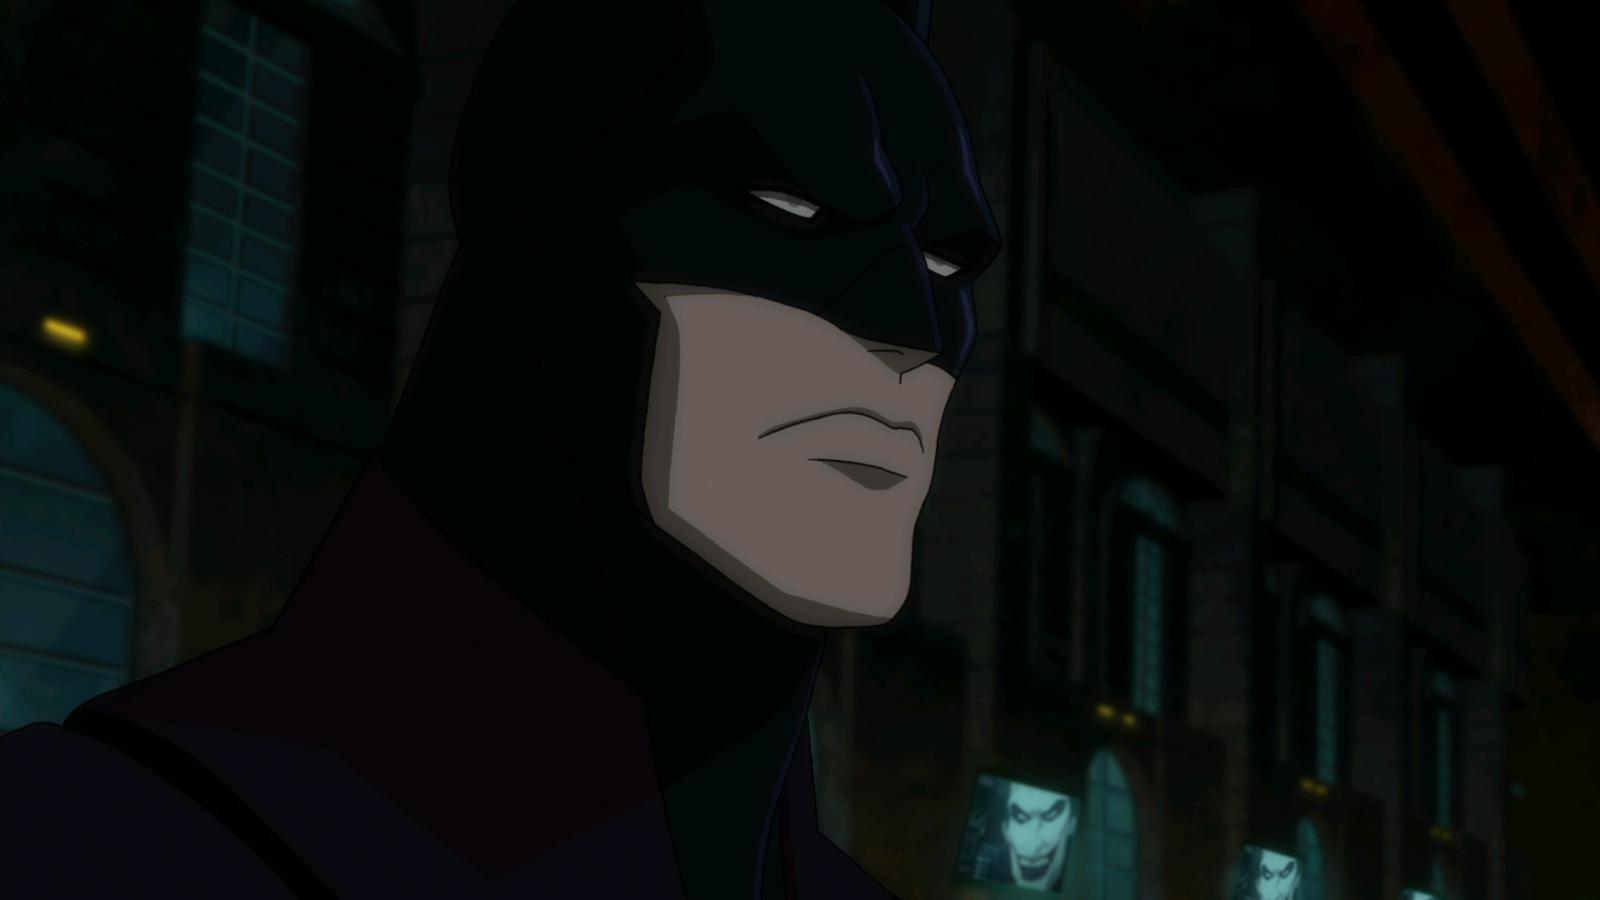 Batman Assault On Arkham (2014) 1080p BD25 8